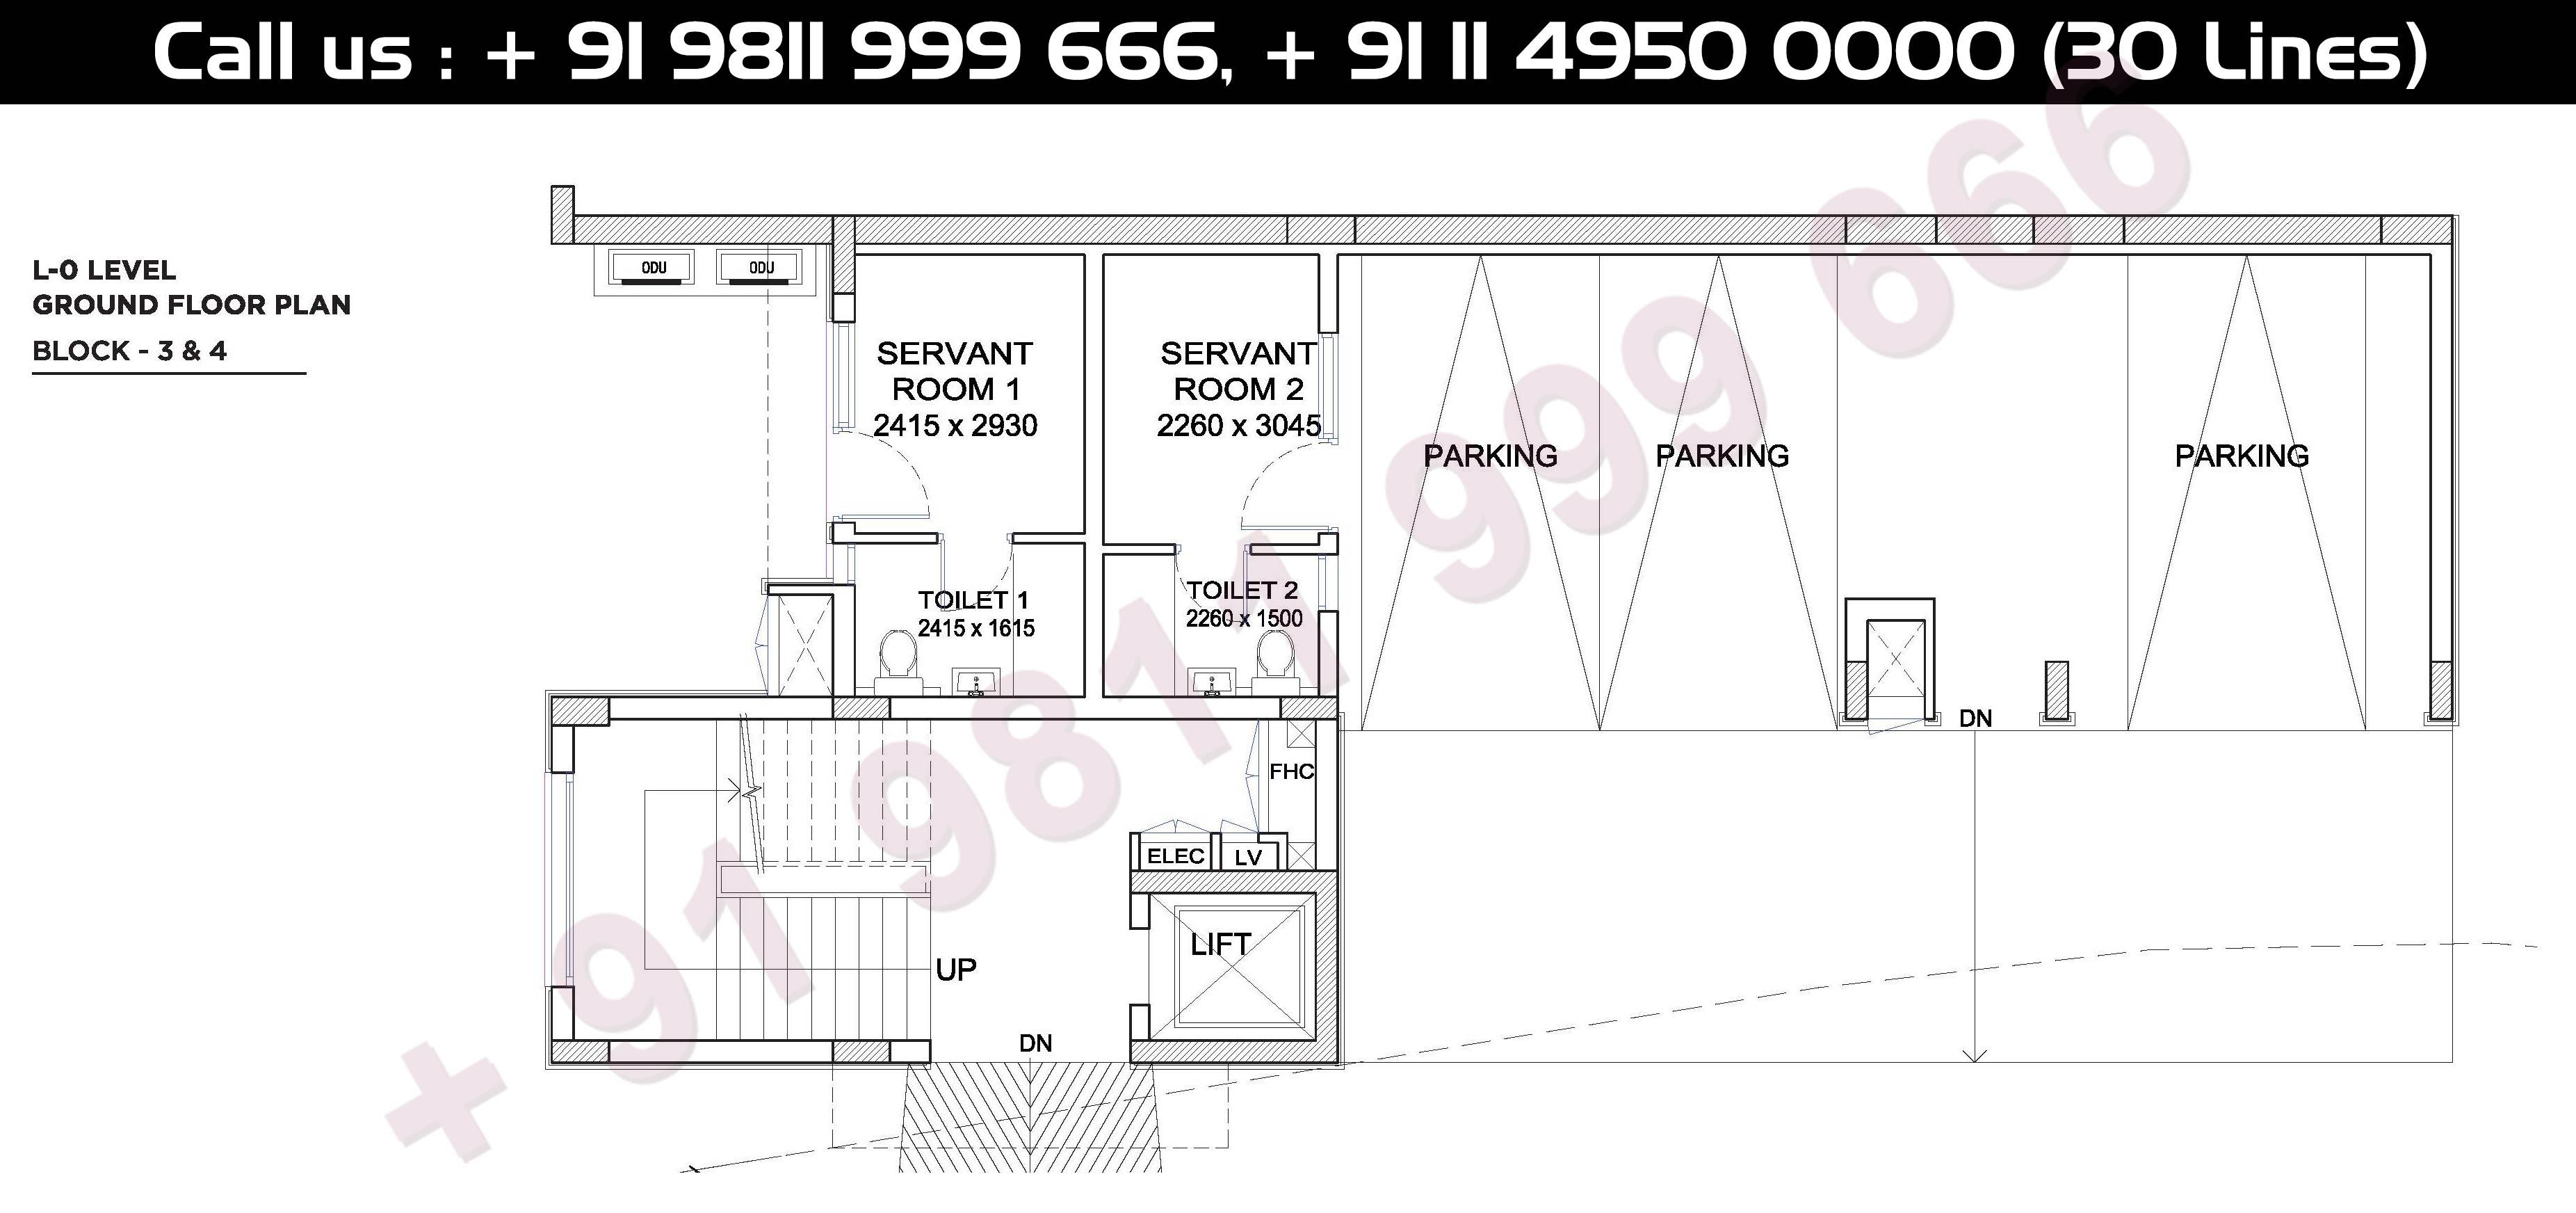 Ground Floor Plan, Block - 3 & 4, Level - 0